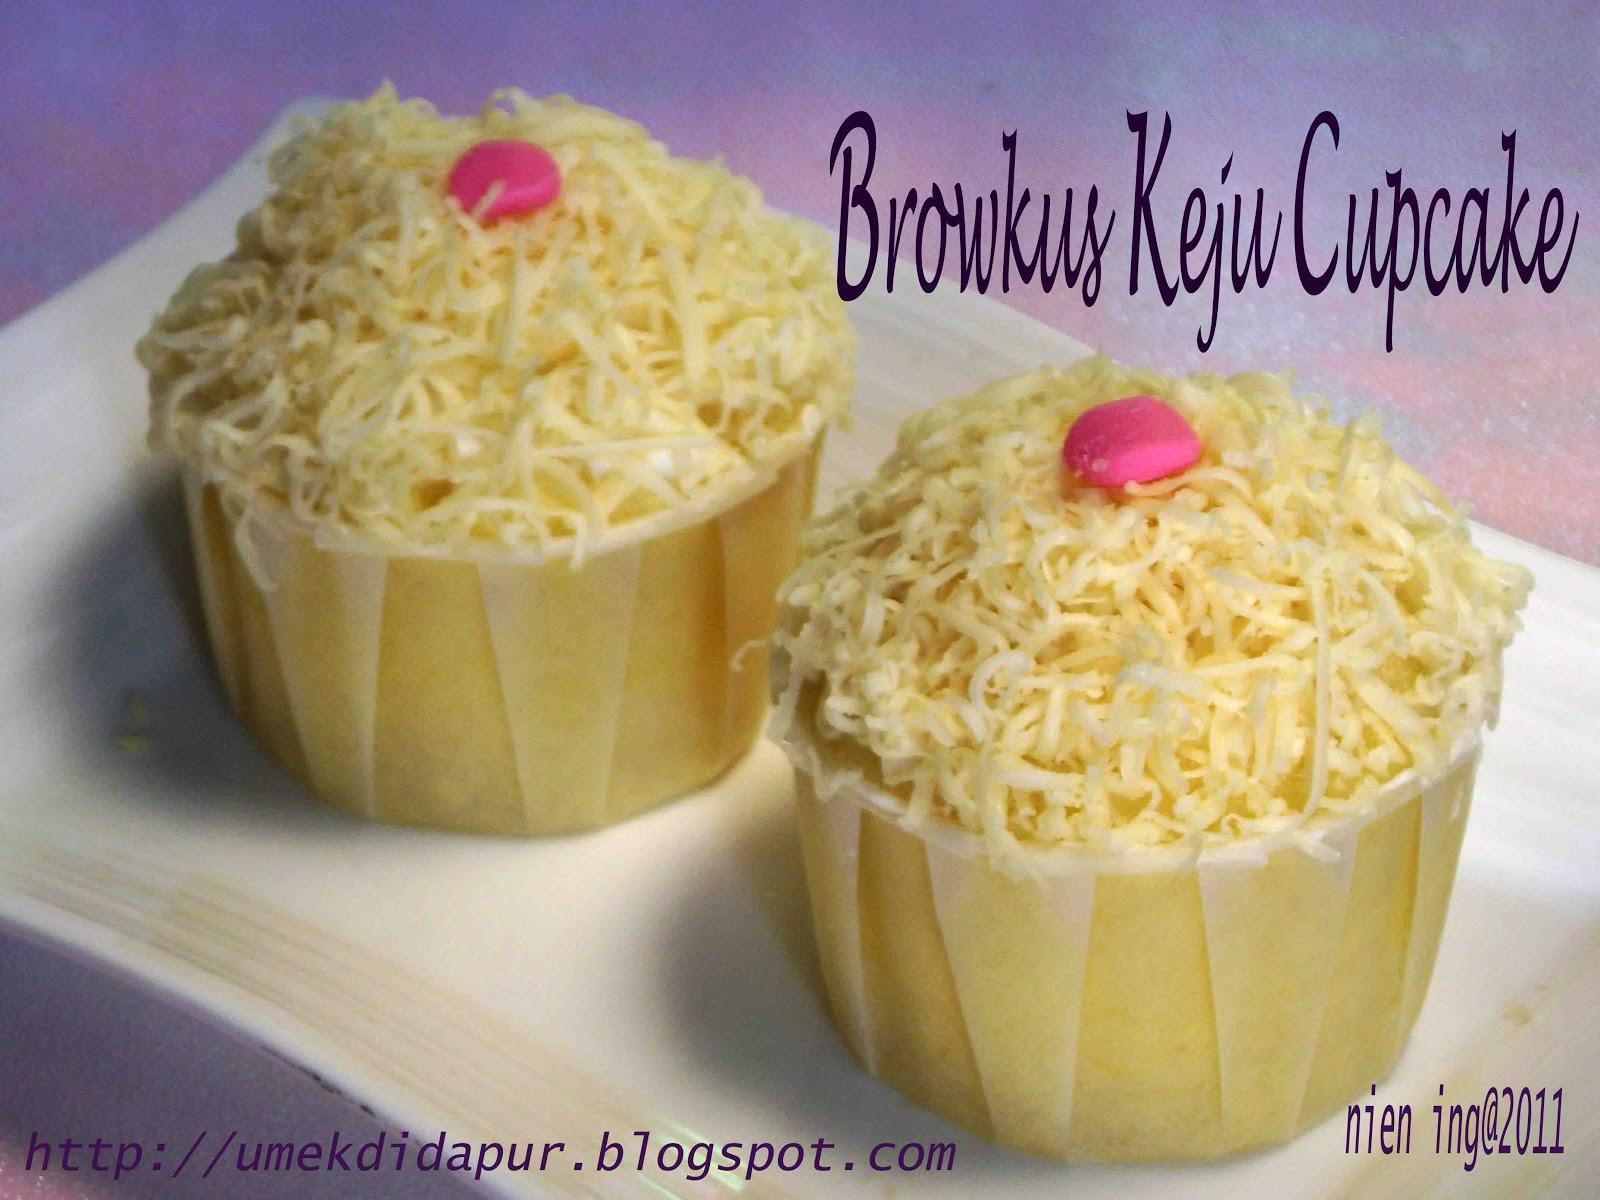 Browkus keju cupcake